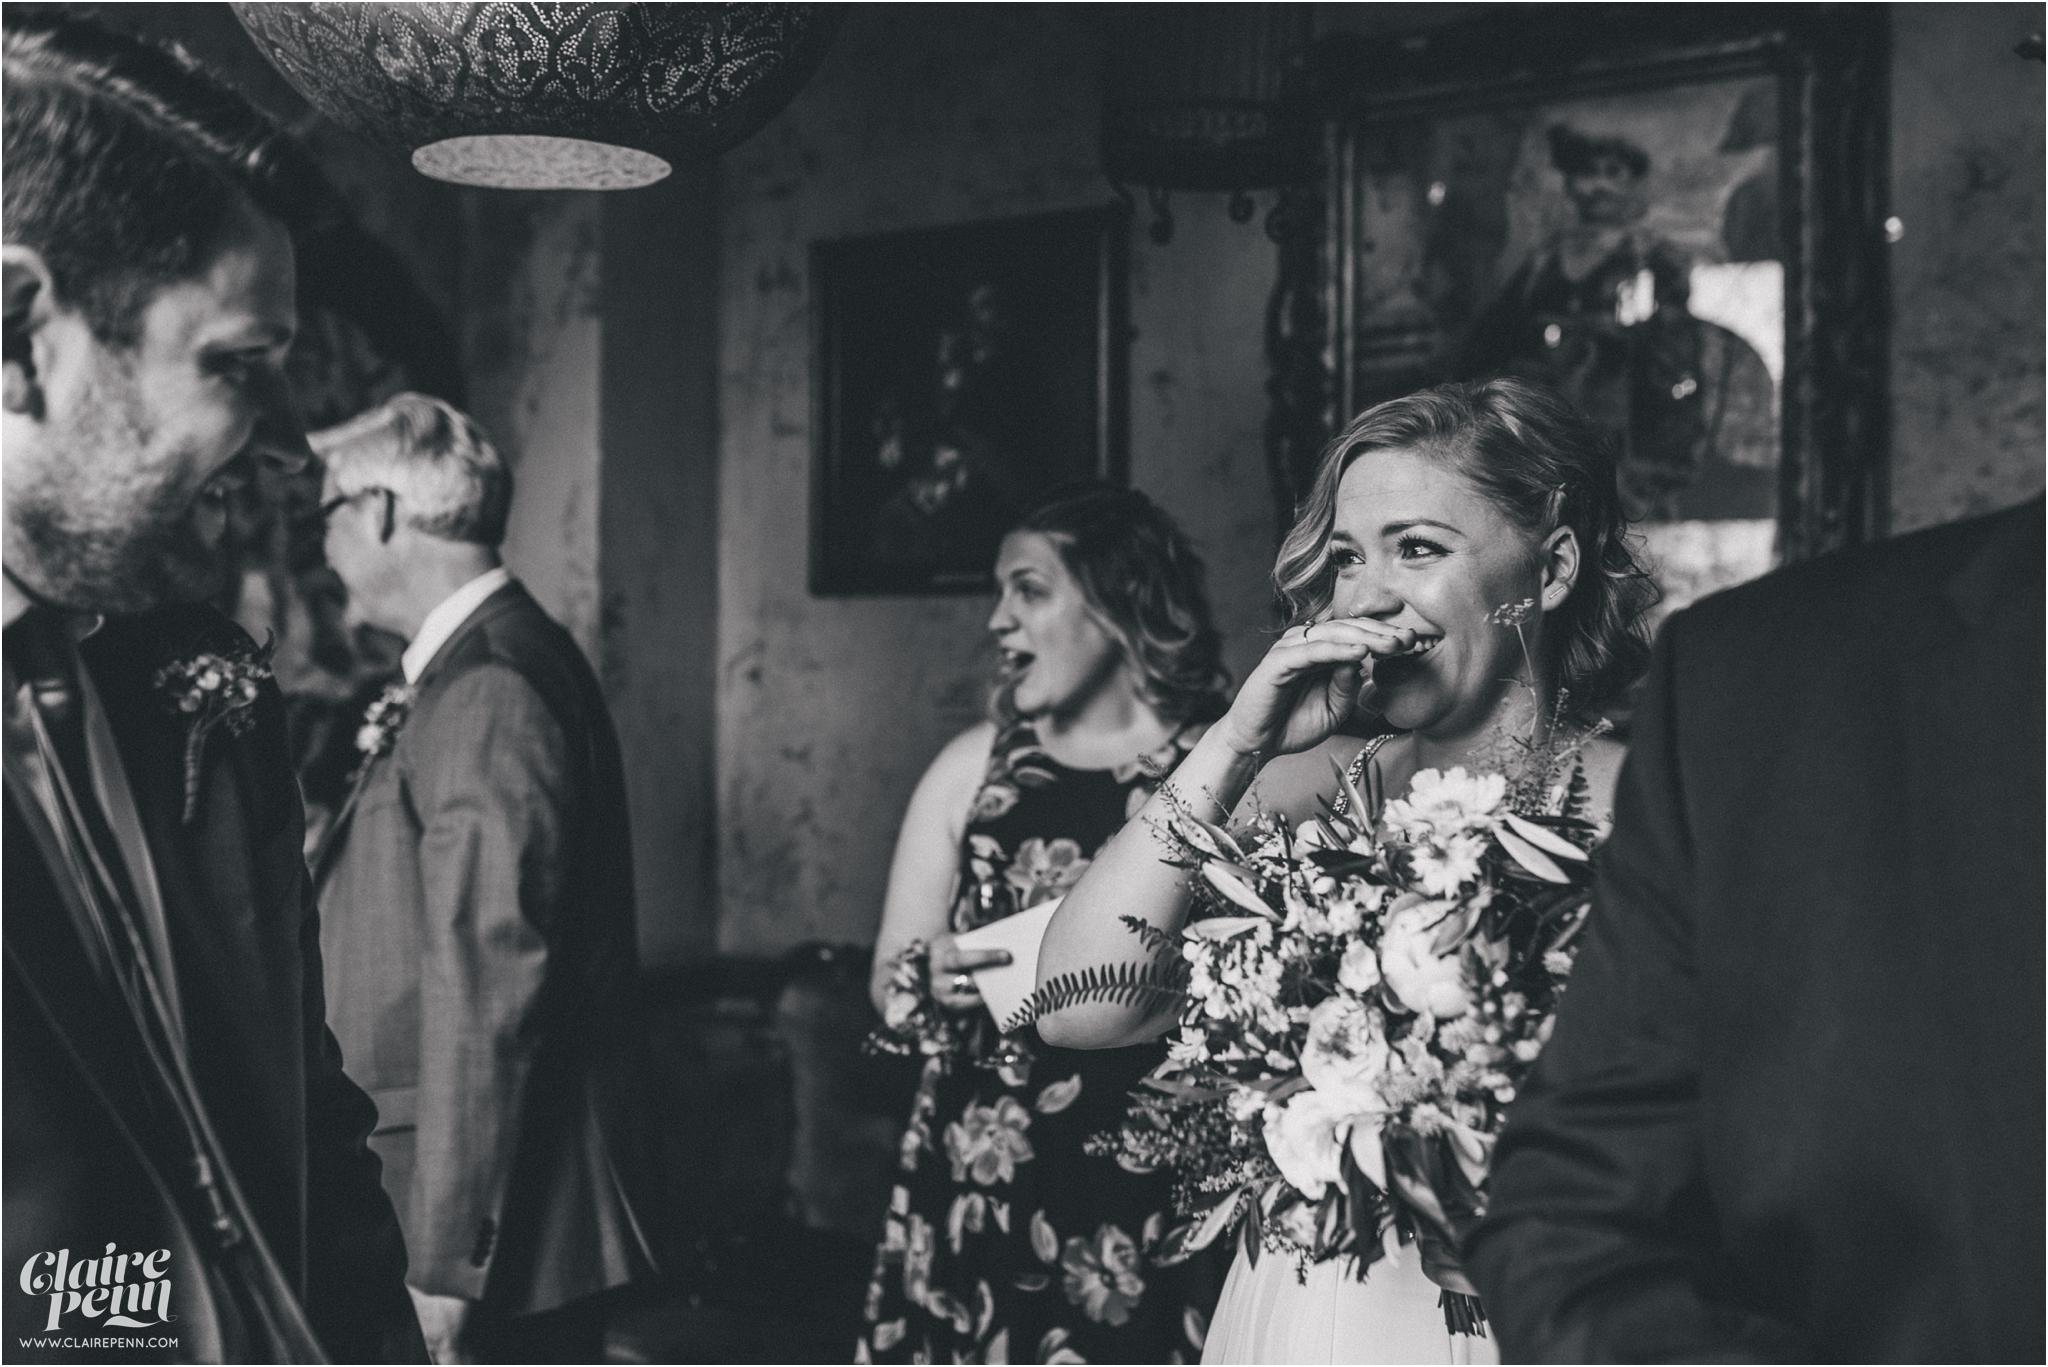 Paradise by way of Kensall Green London pub intimate wedding_0021.jpg